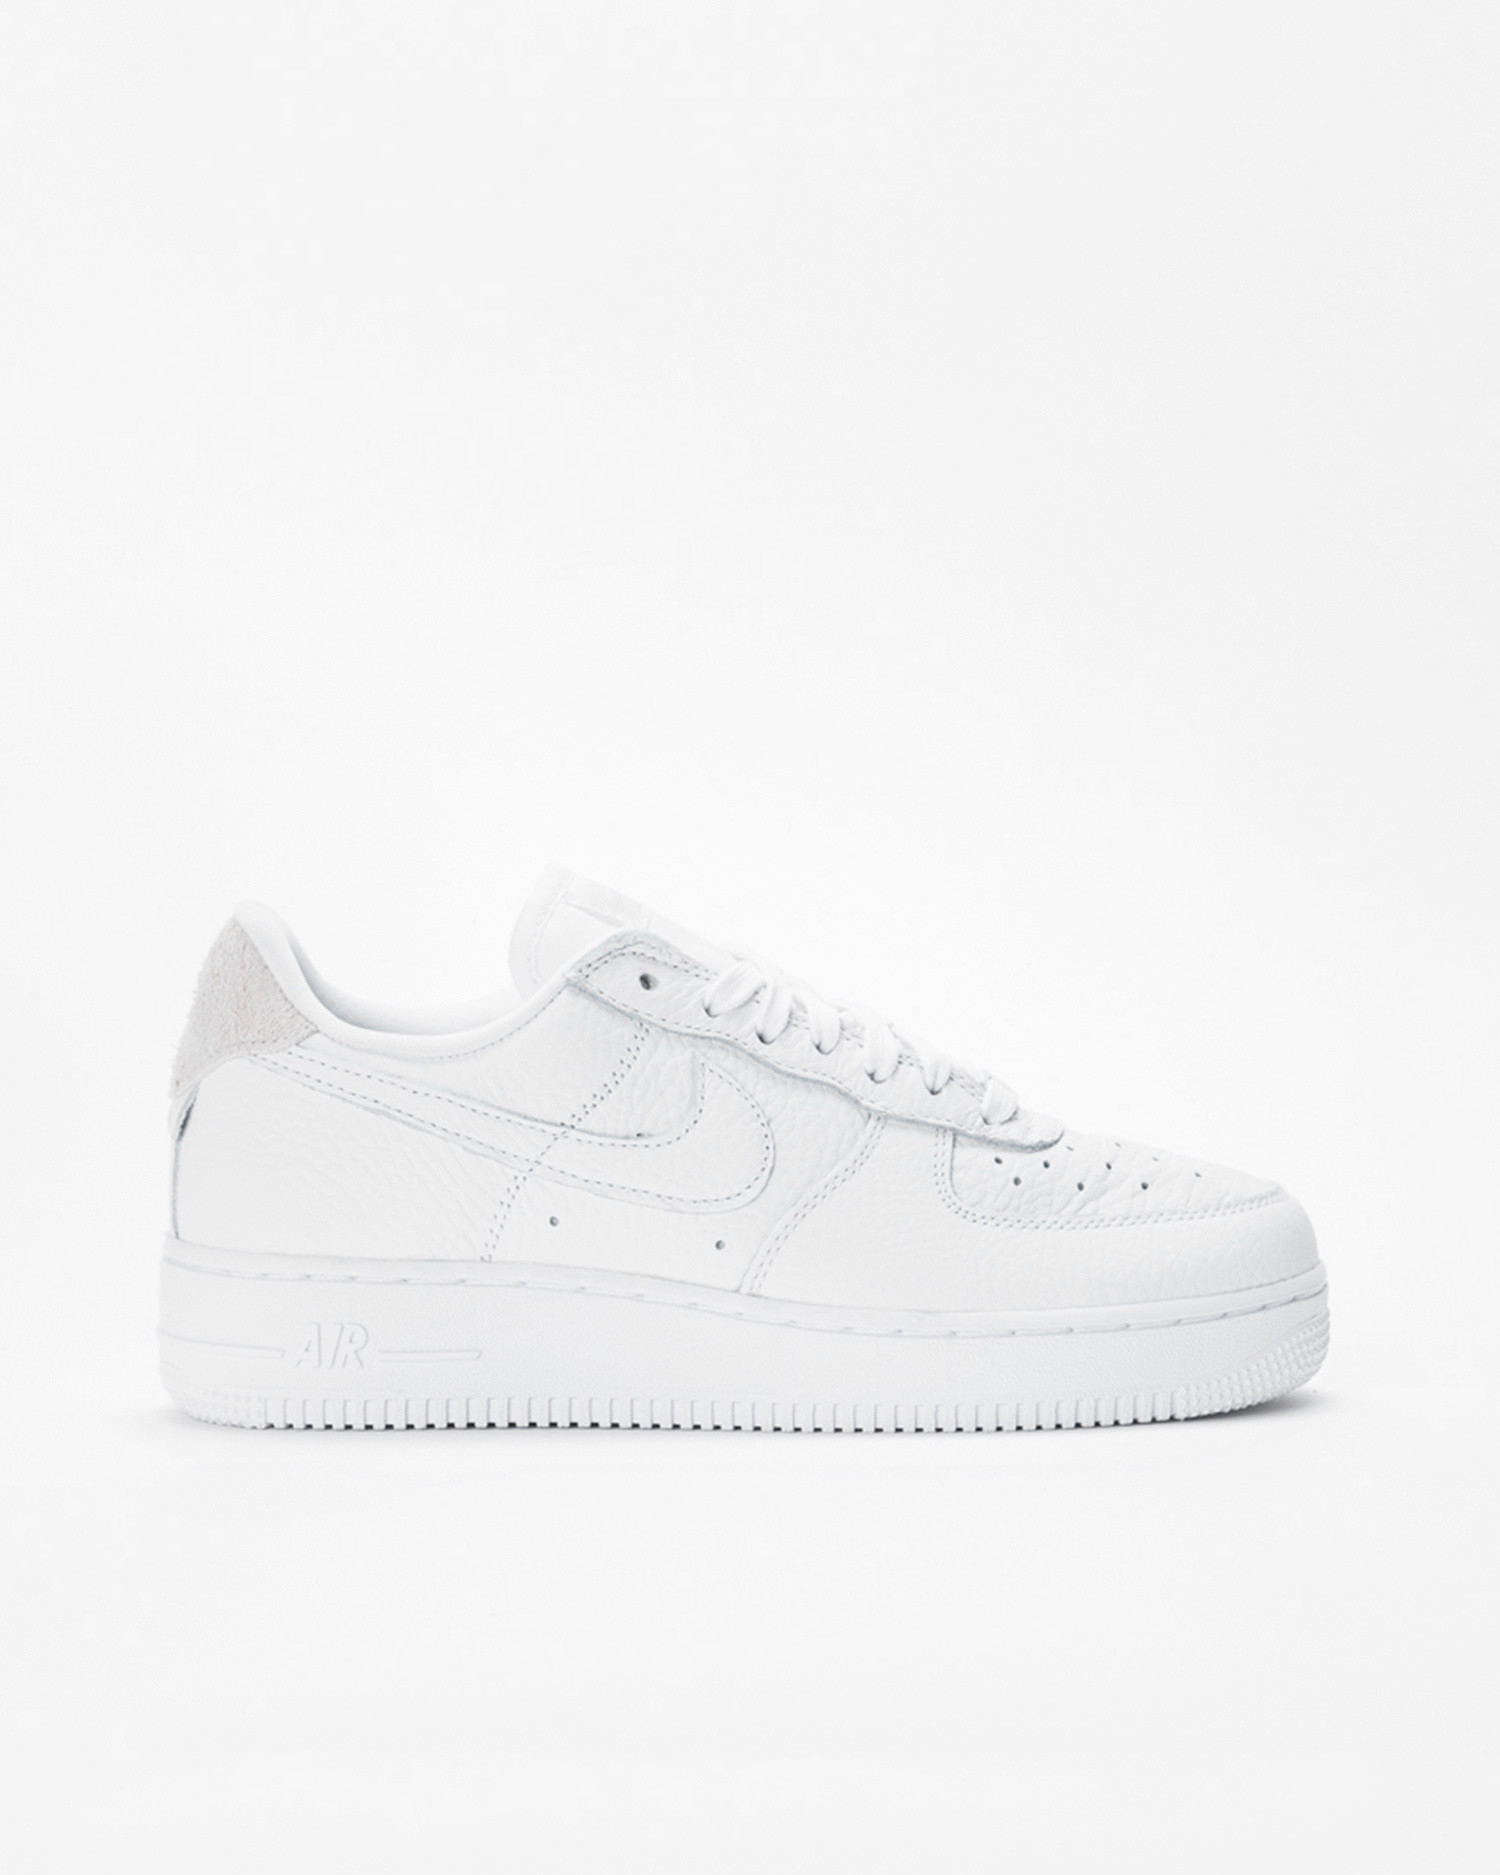 Nike Air Force 1'07 Craft White/White